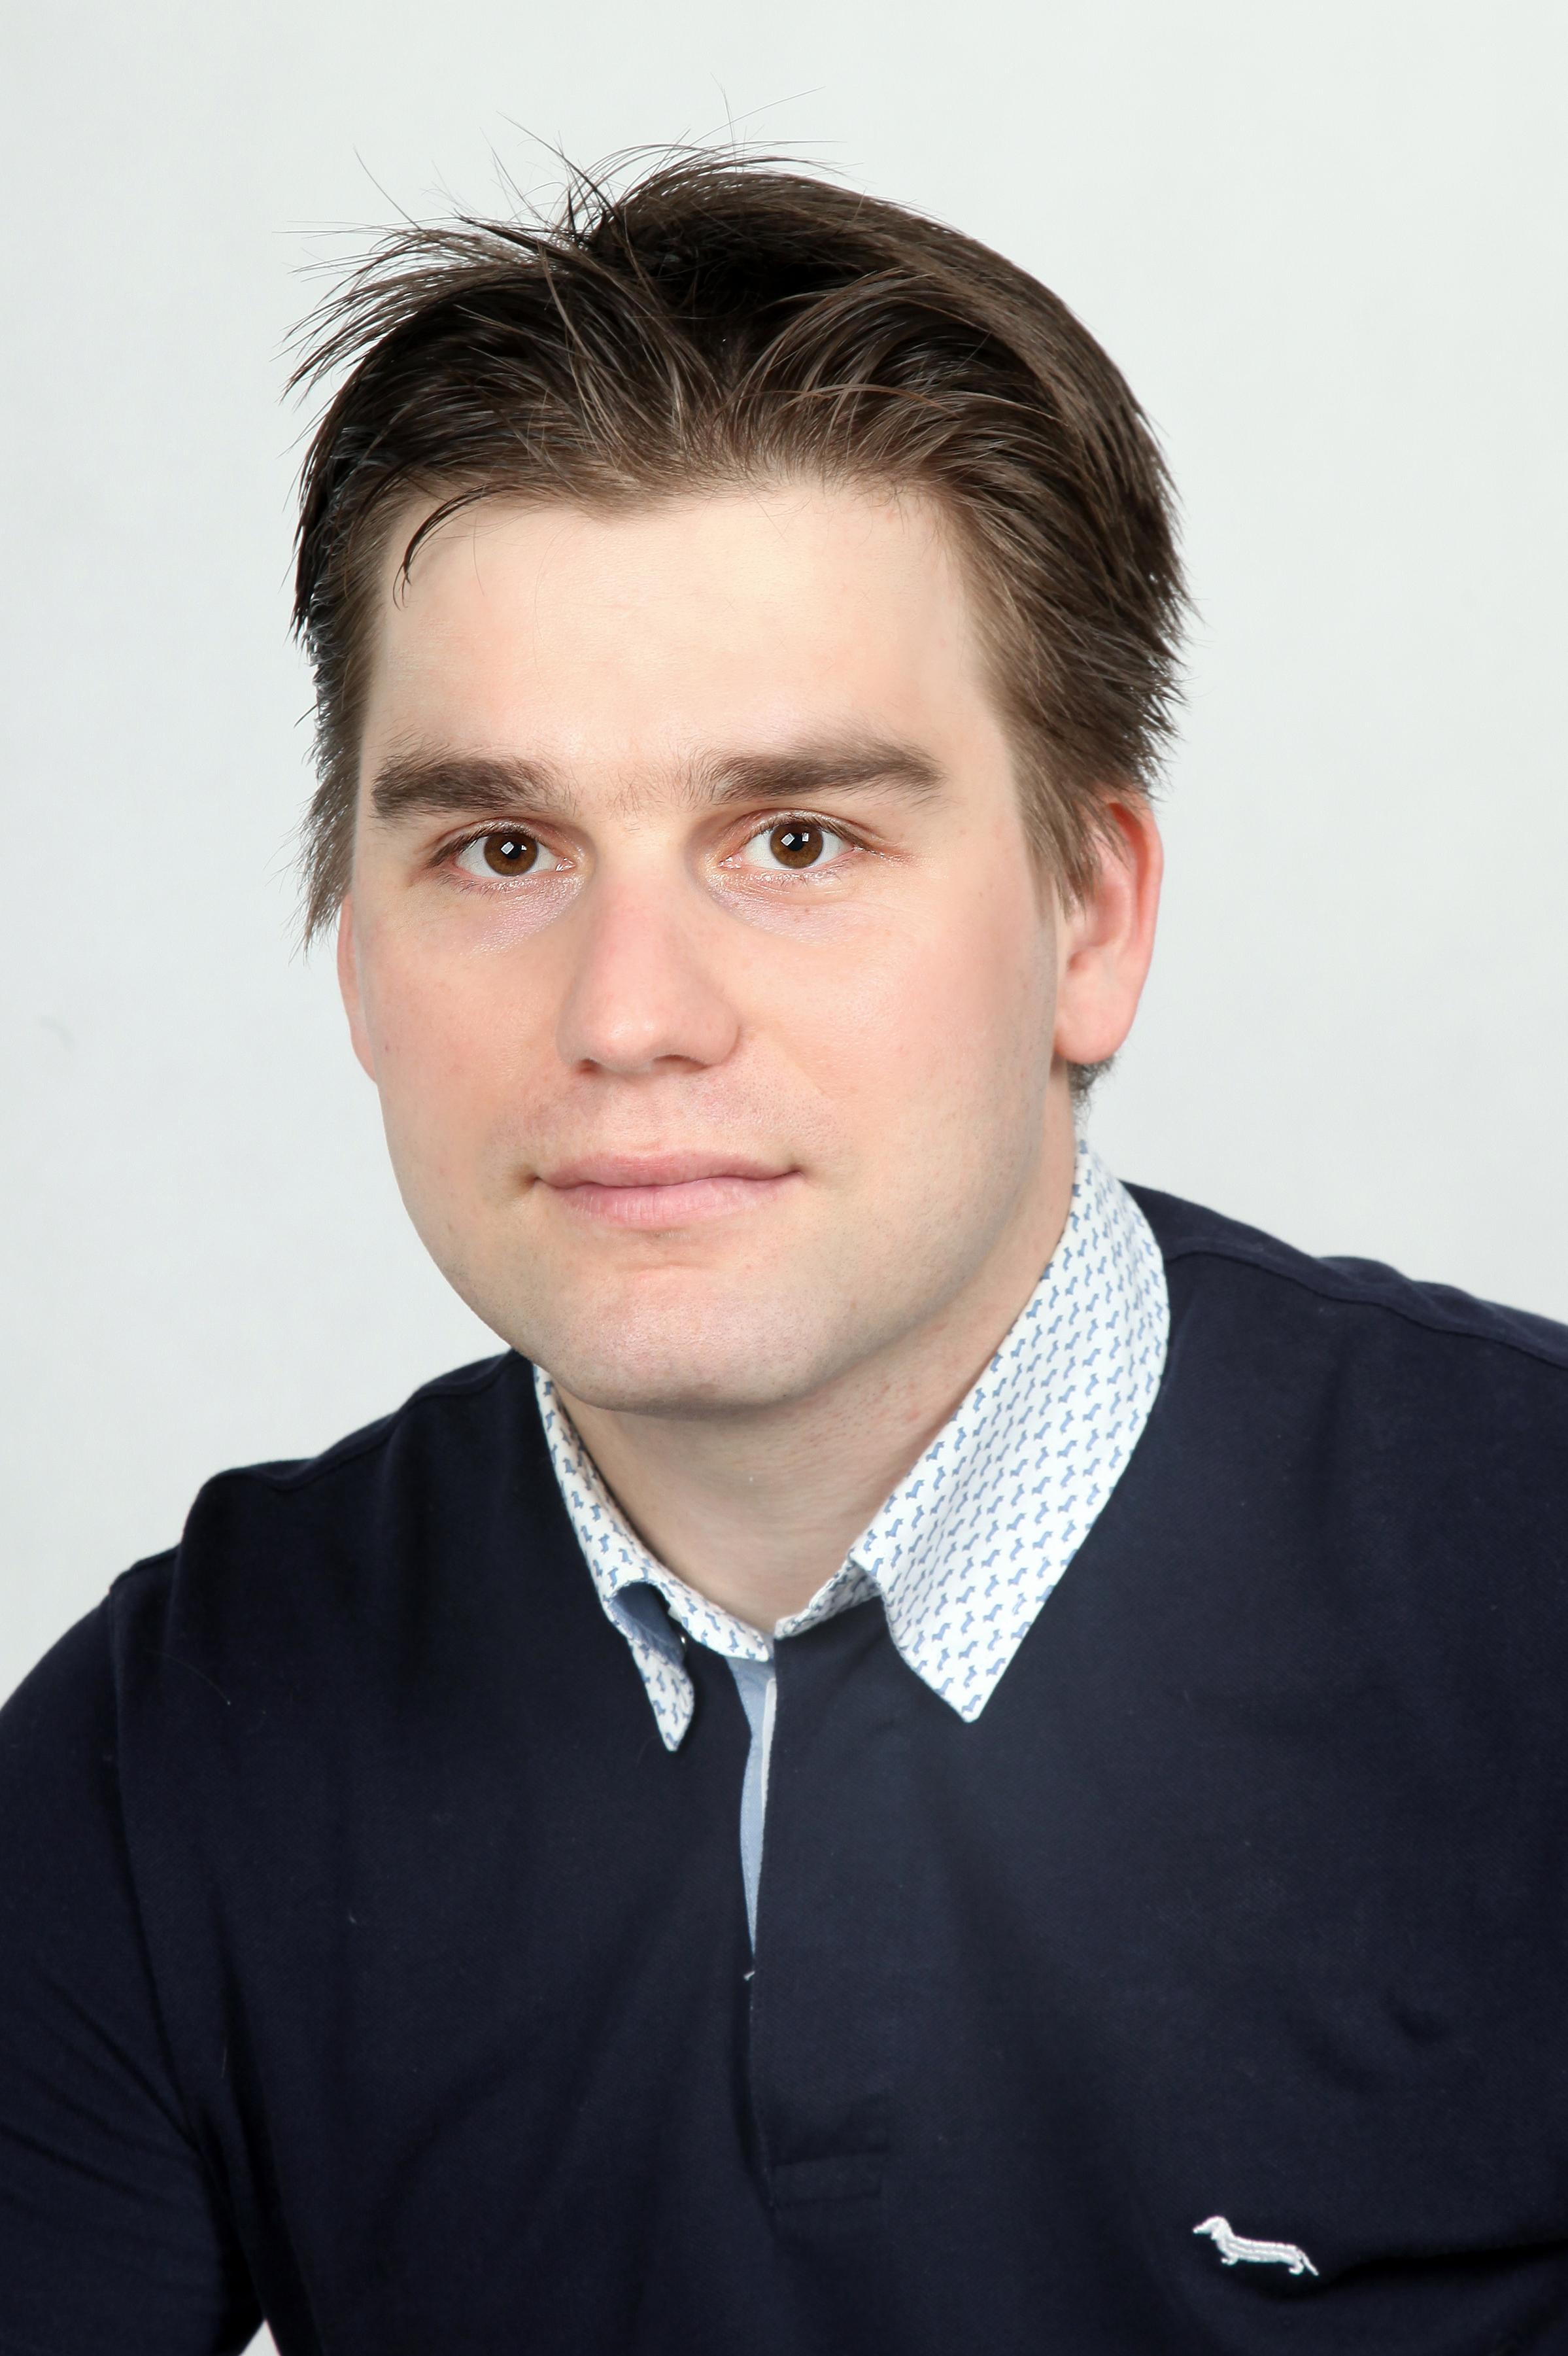 MUDr. Martin Gábor, PhD.